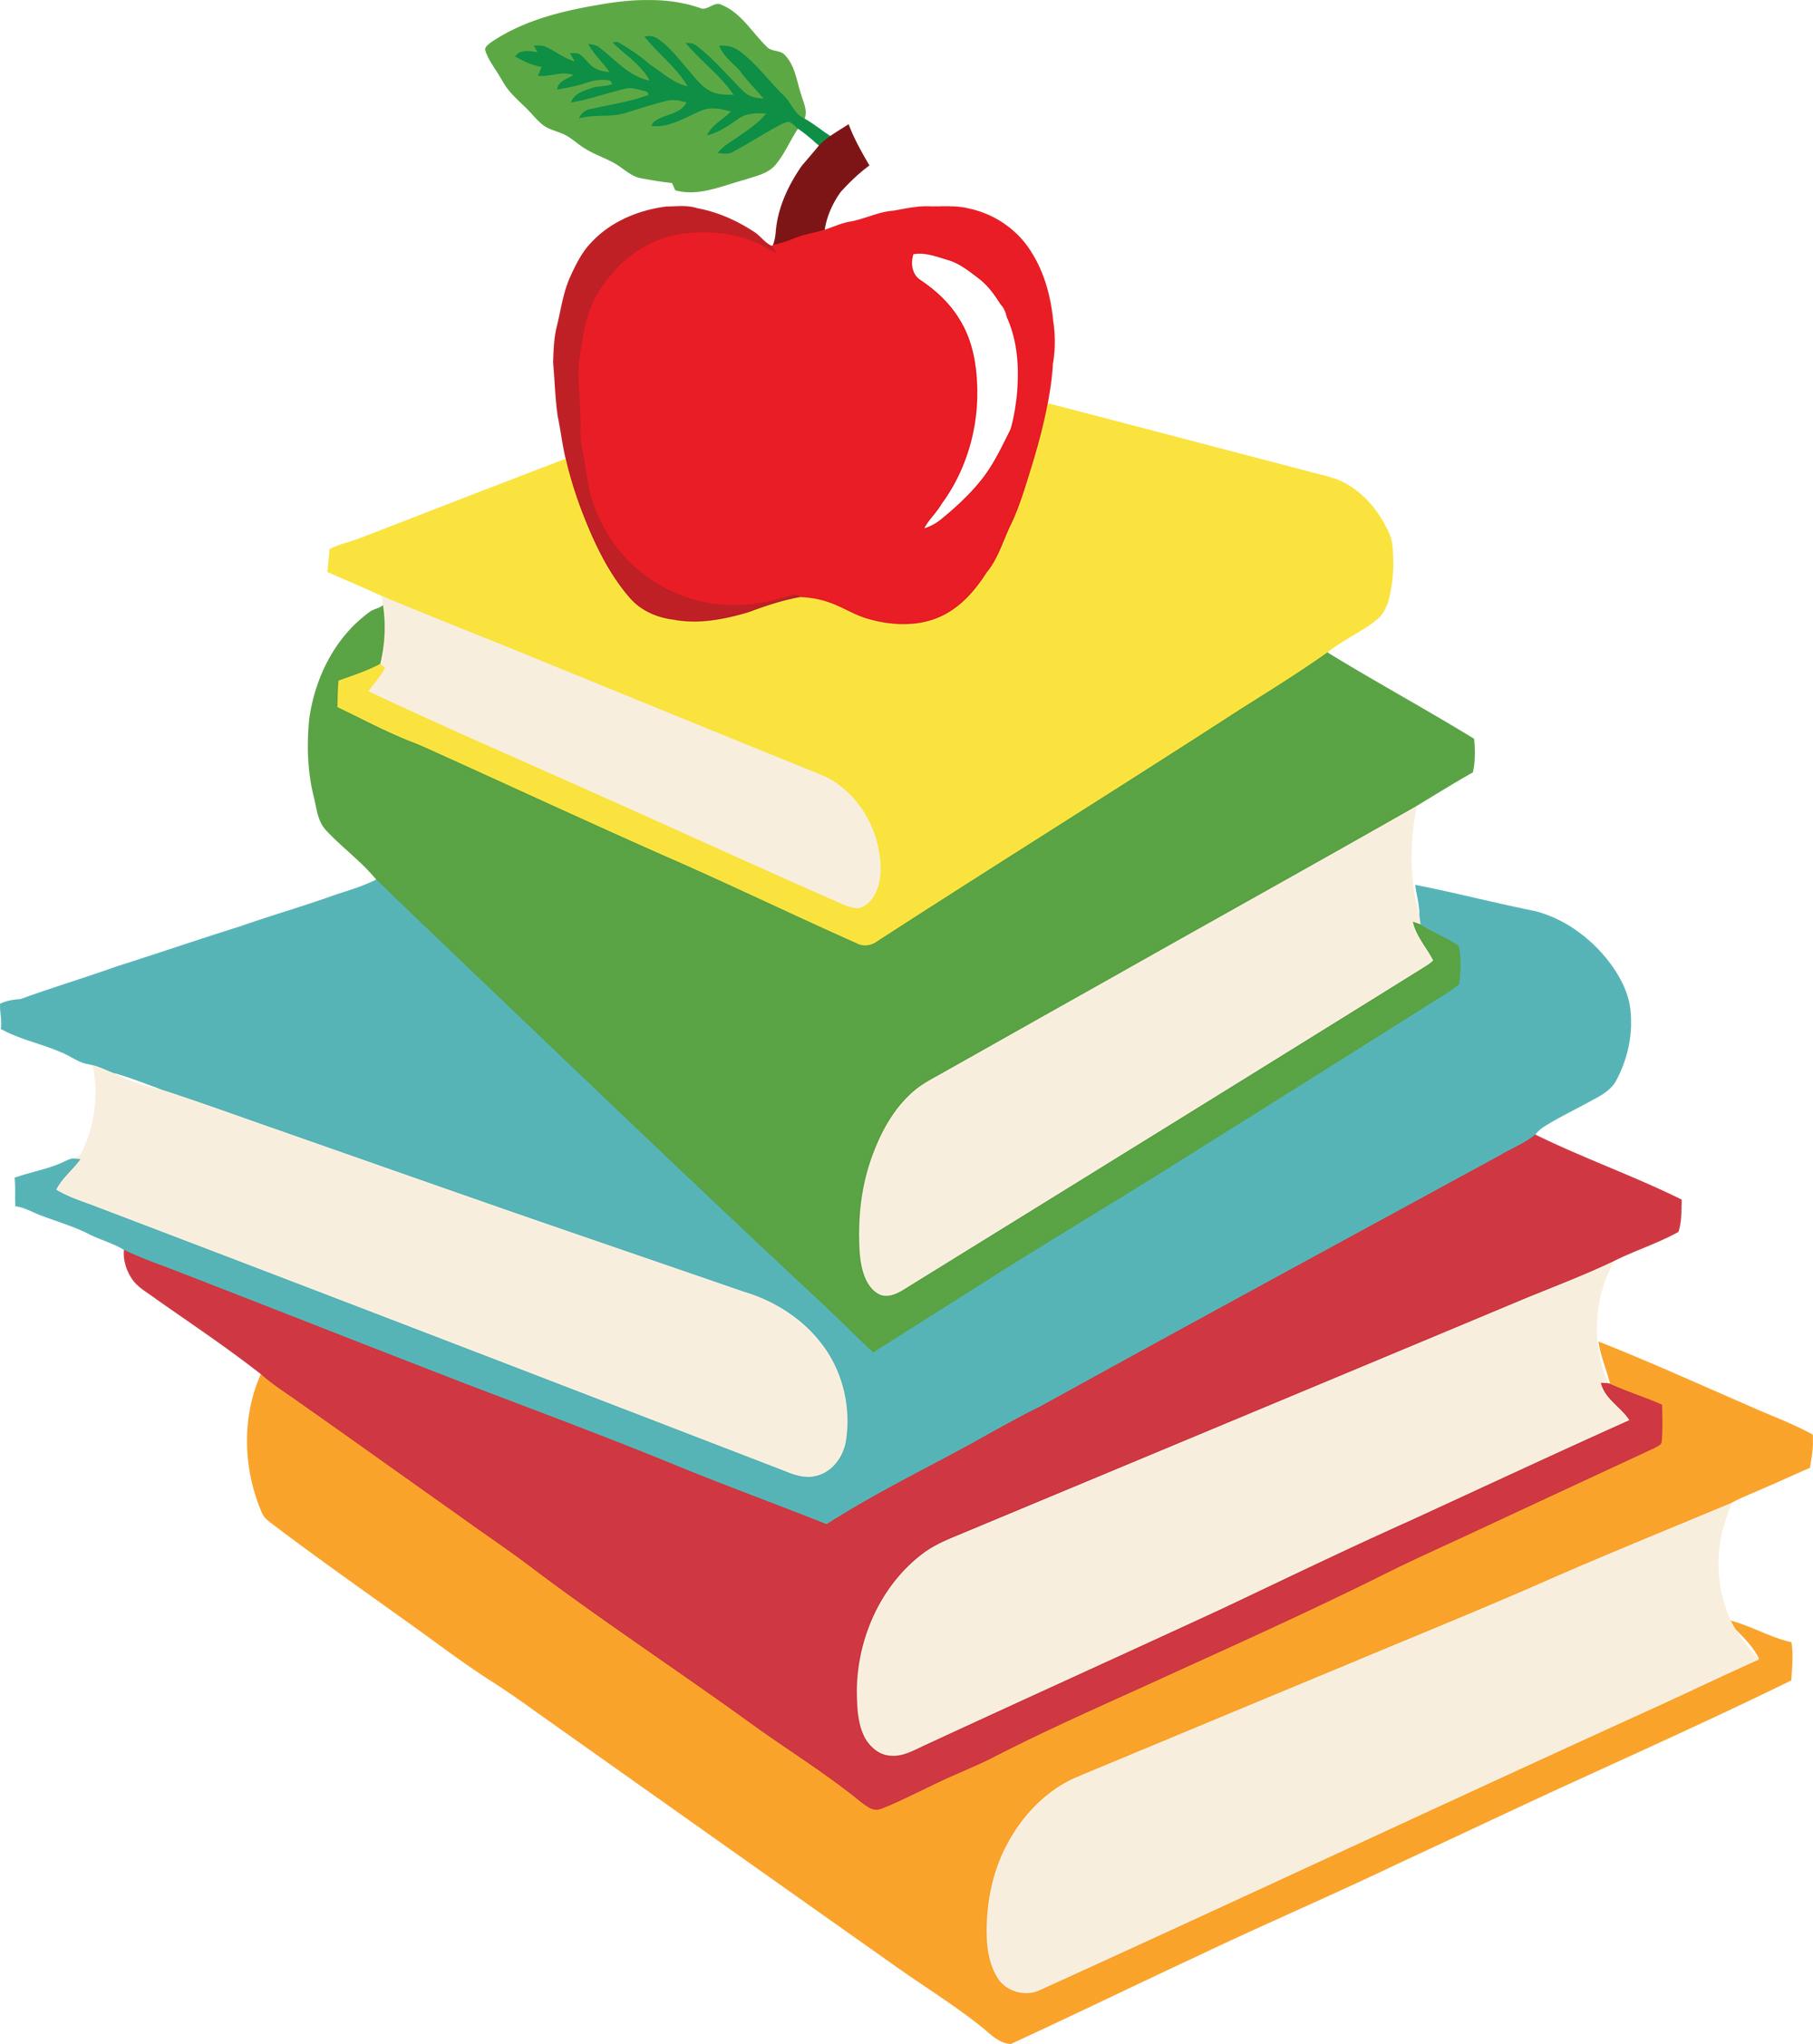 School books clipart - Clipground